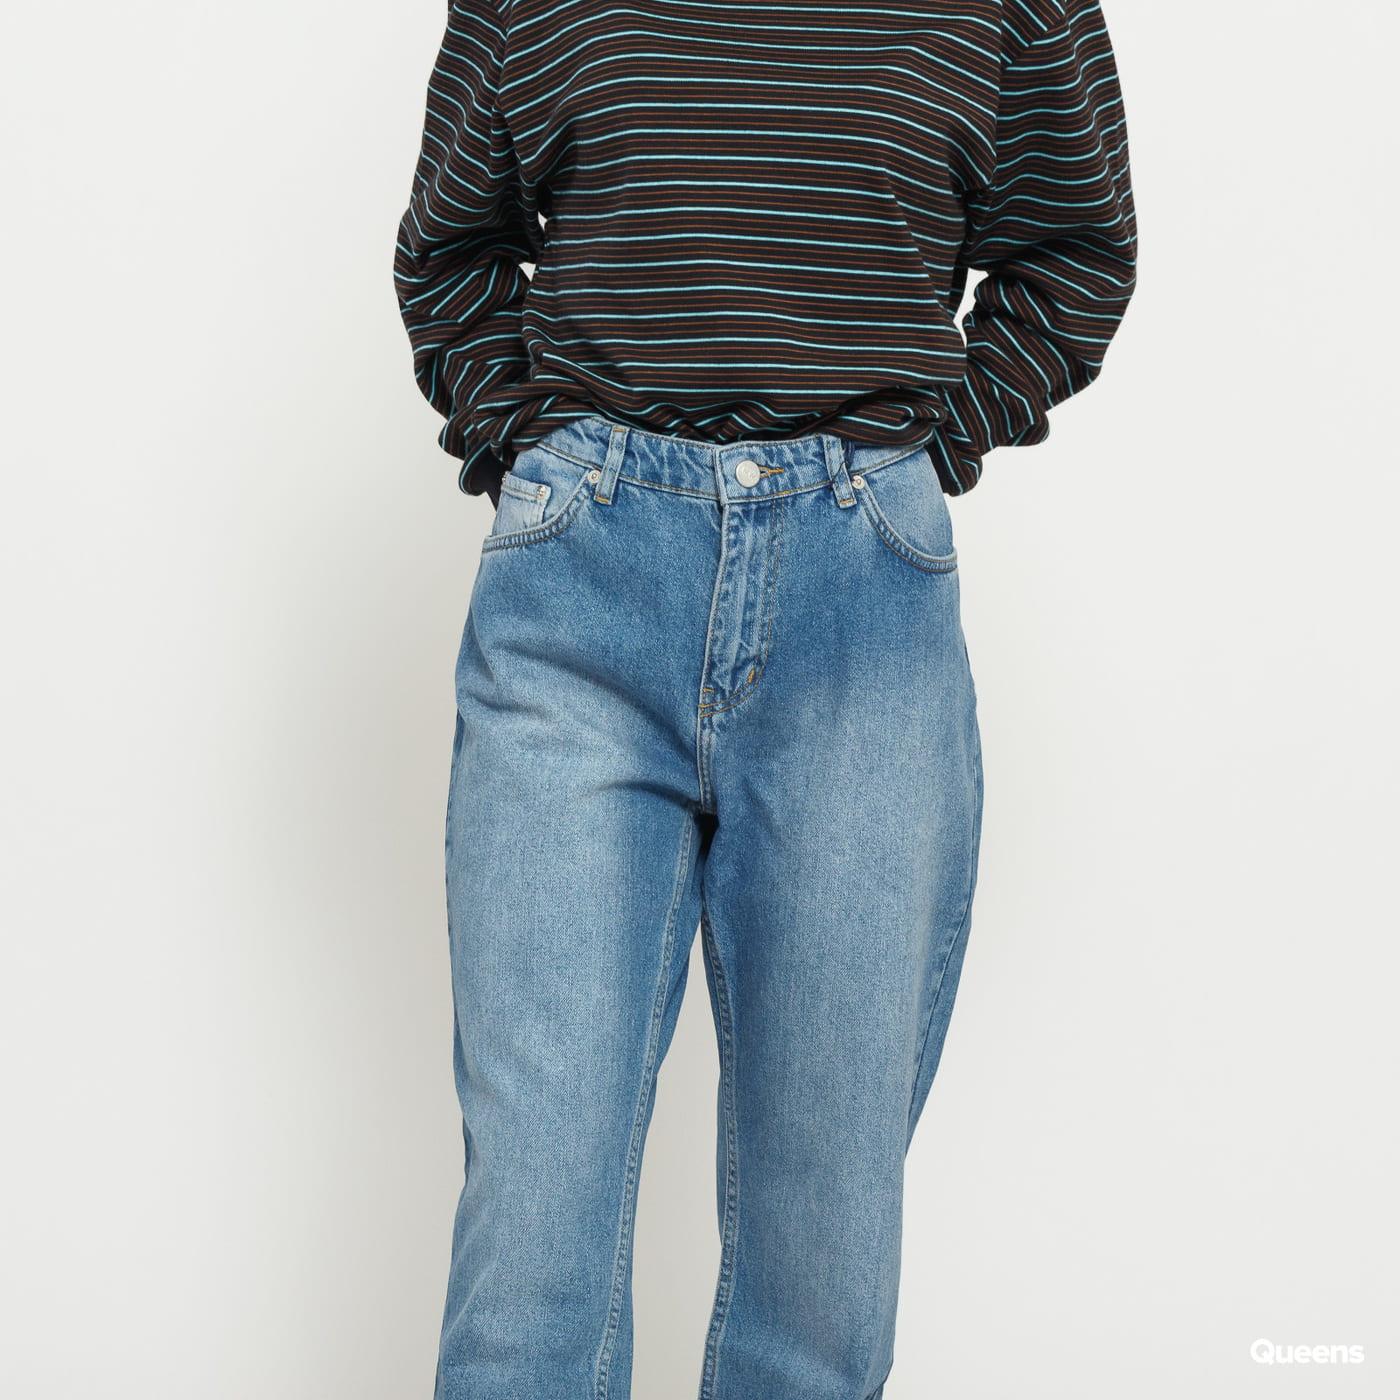 WOOD WOOD Eve Jeans classic blue vintage